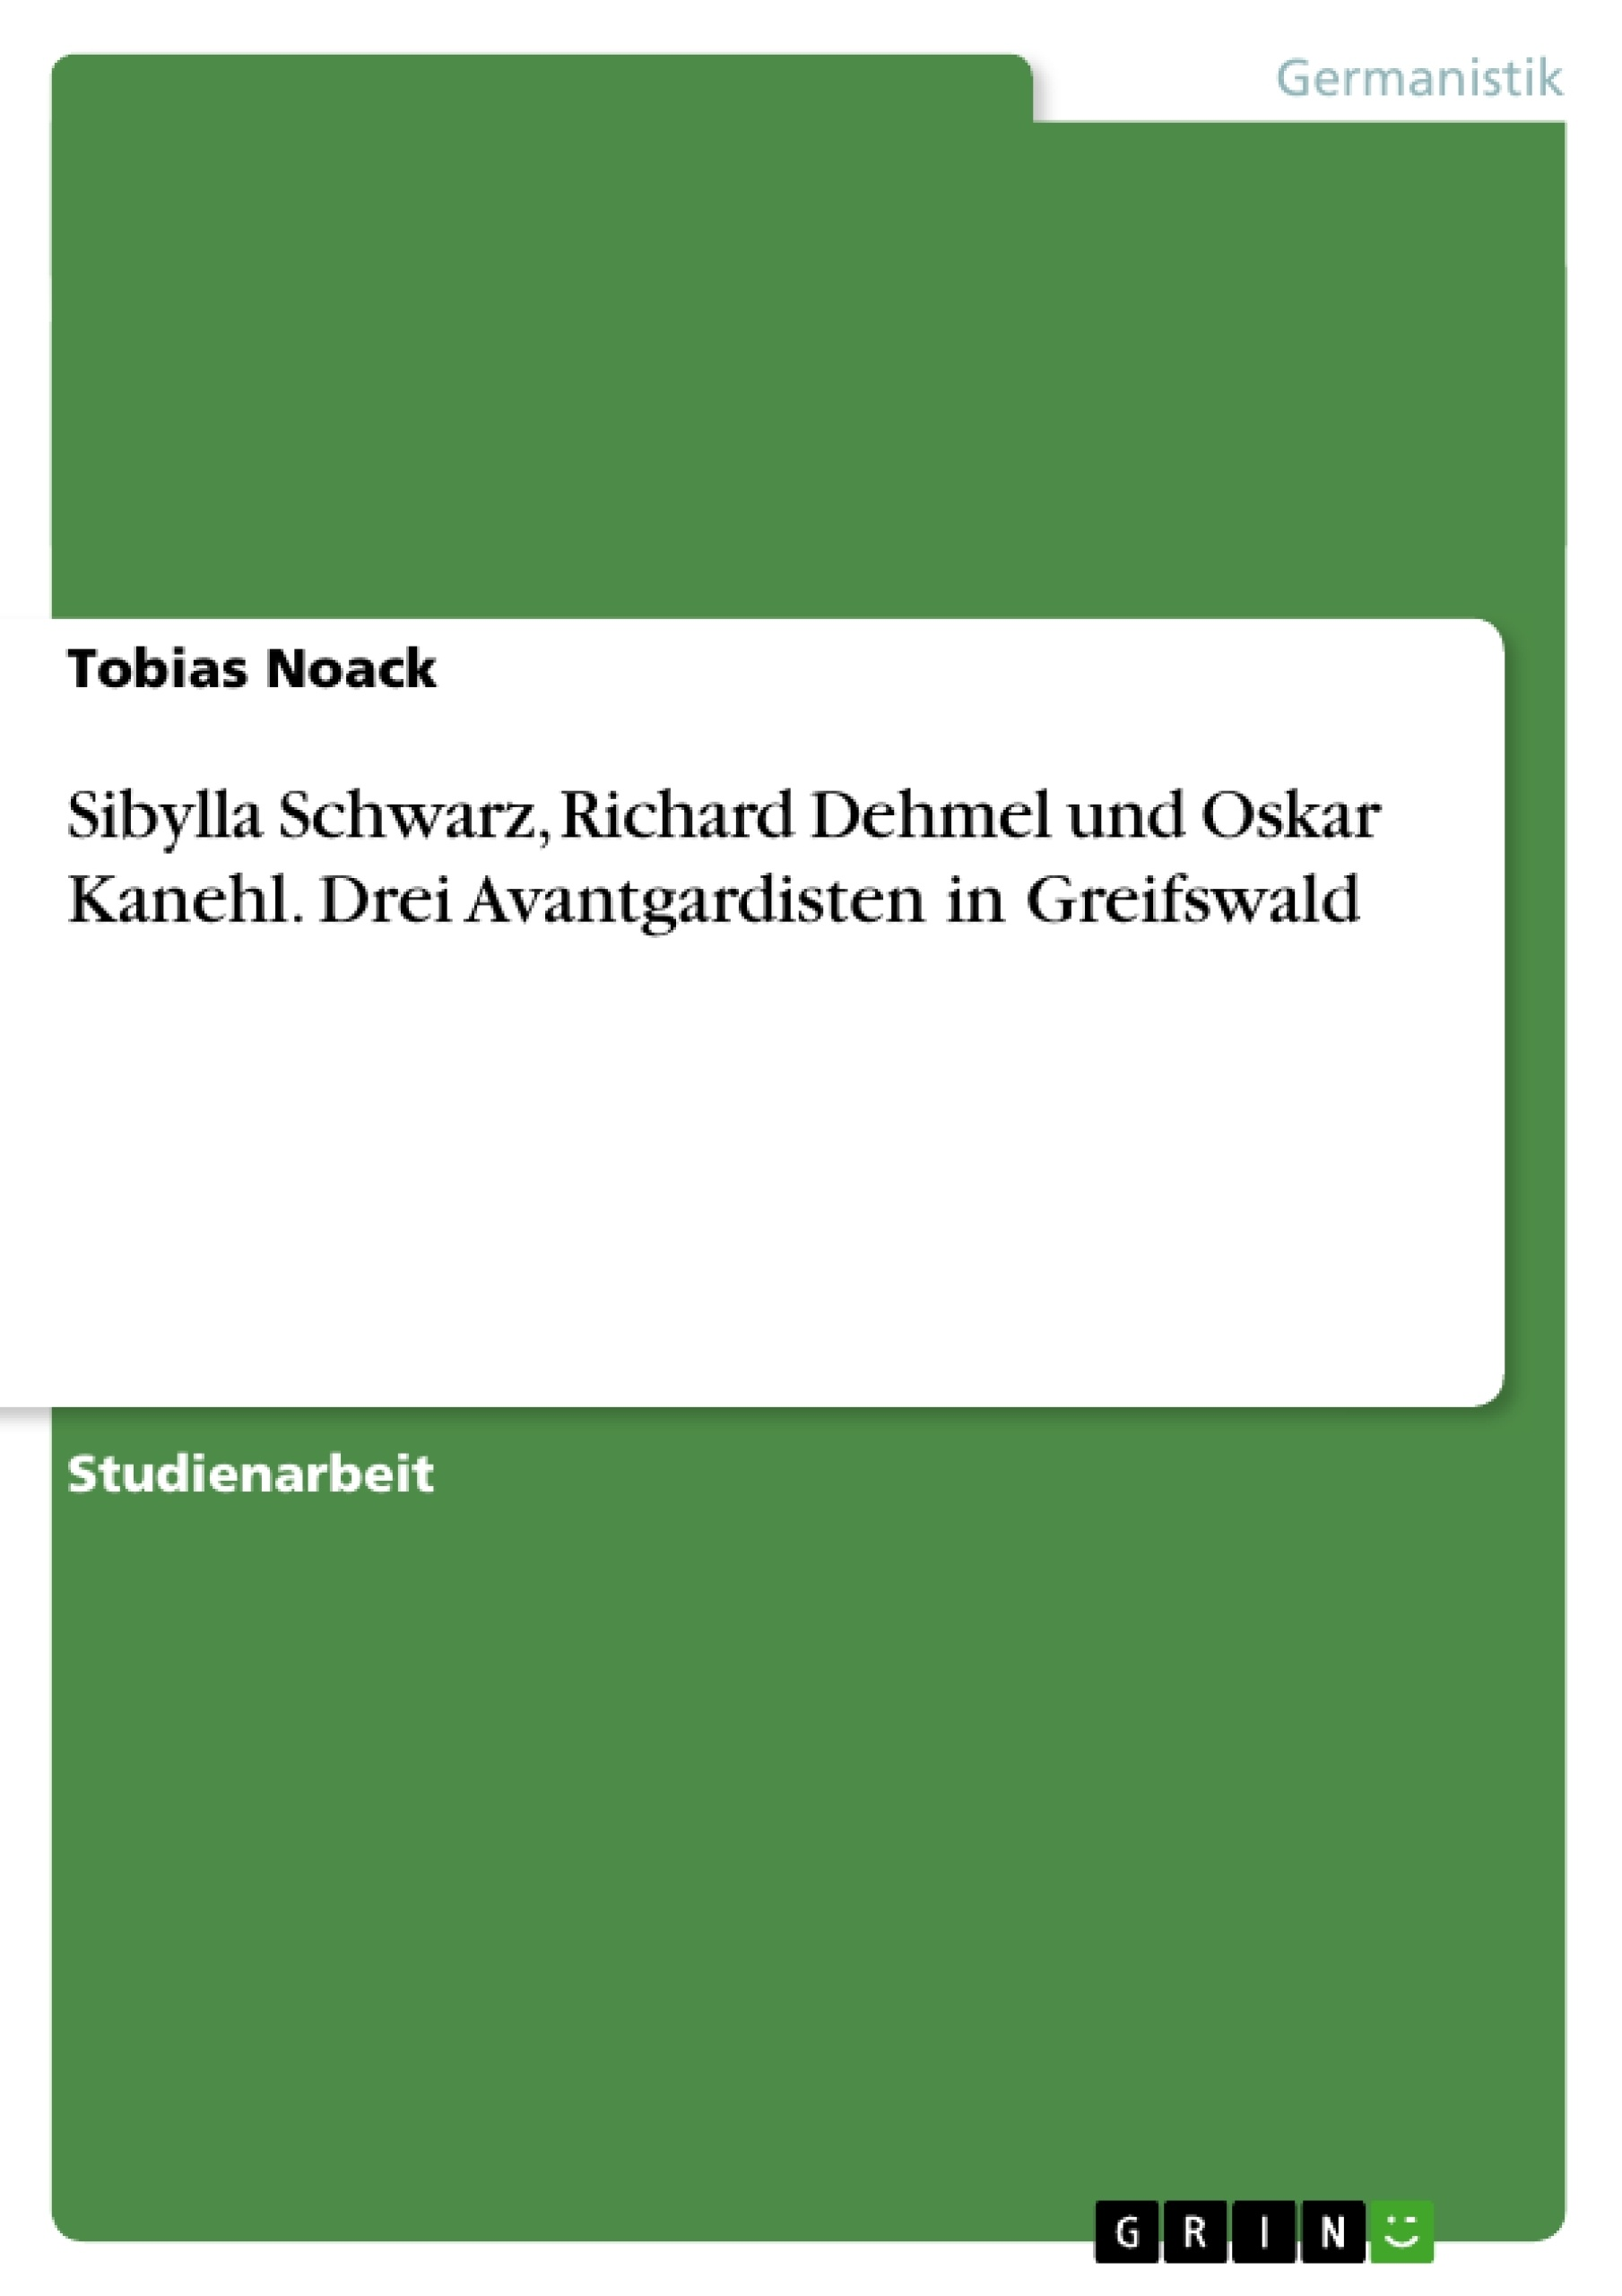 Titel: Sibylla Schwarz, Richard Dehmel und Oskar Kanehl. Drei Avantgardisten in  Greifswald